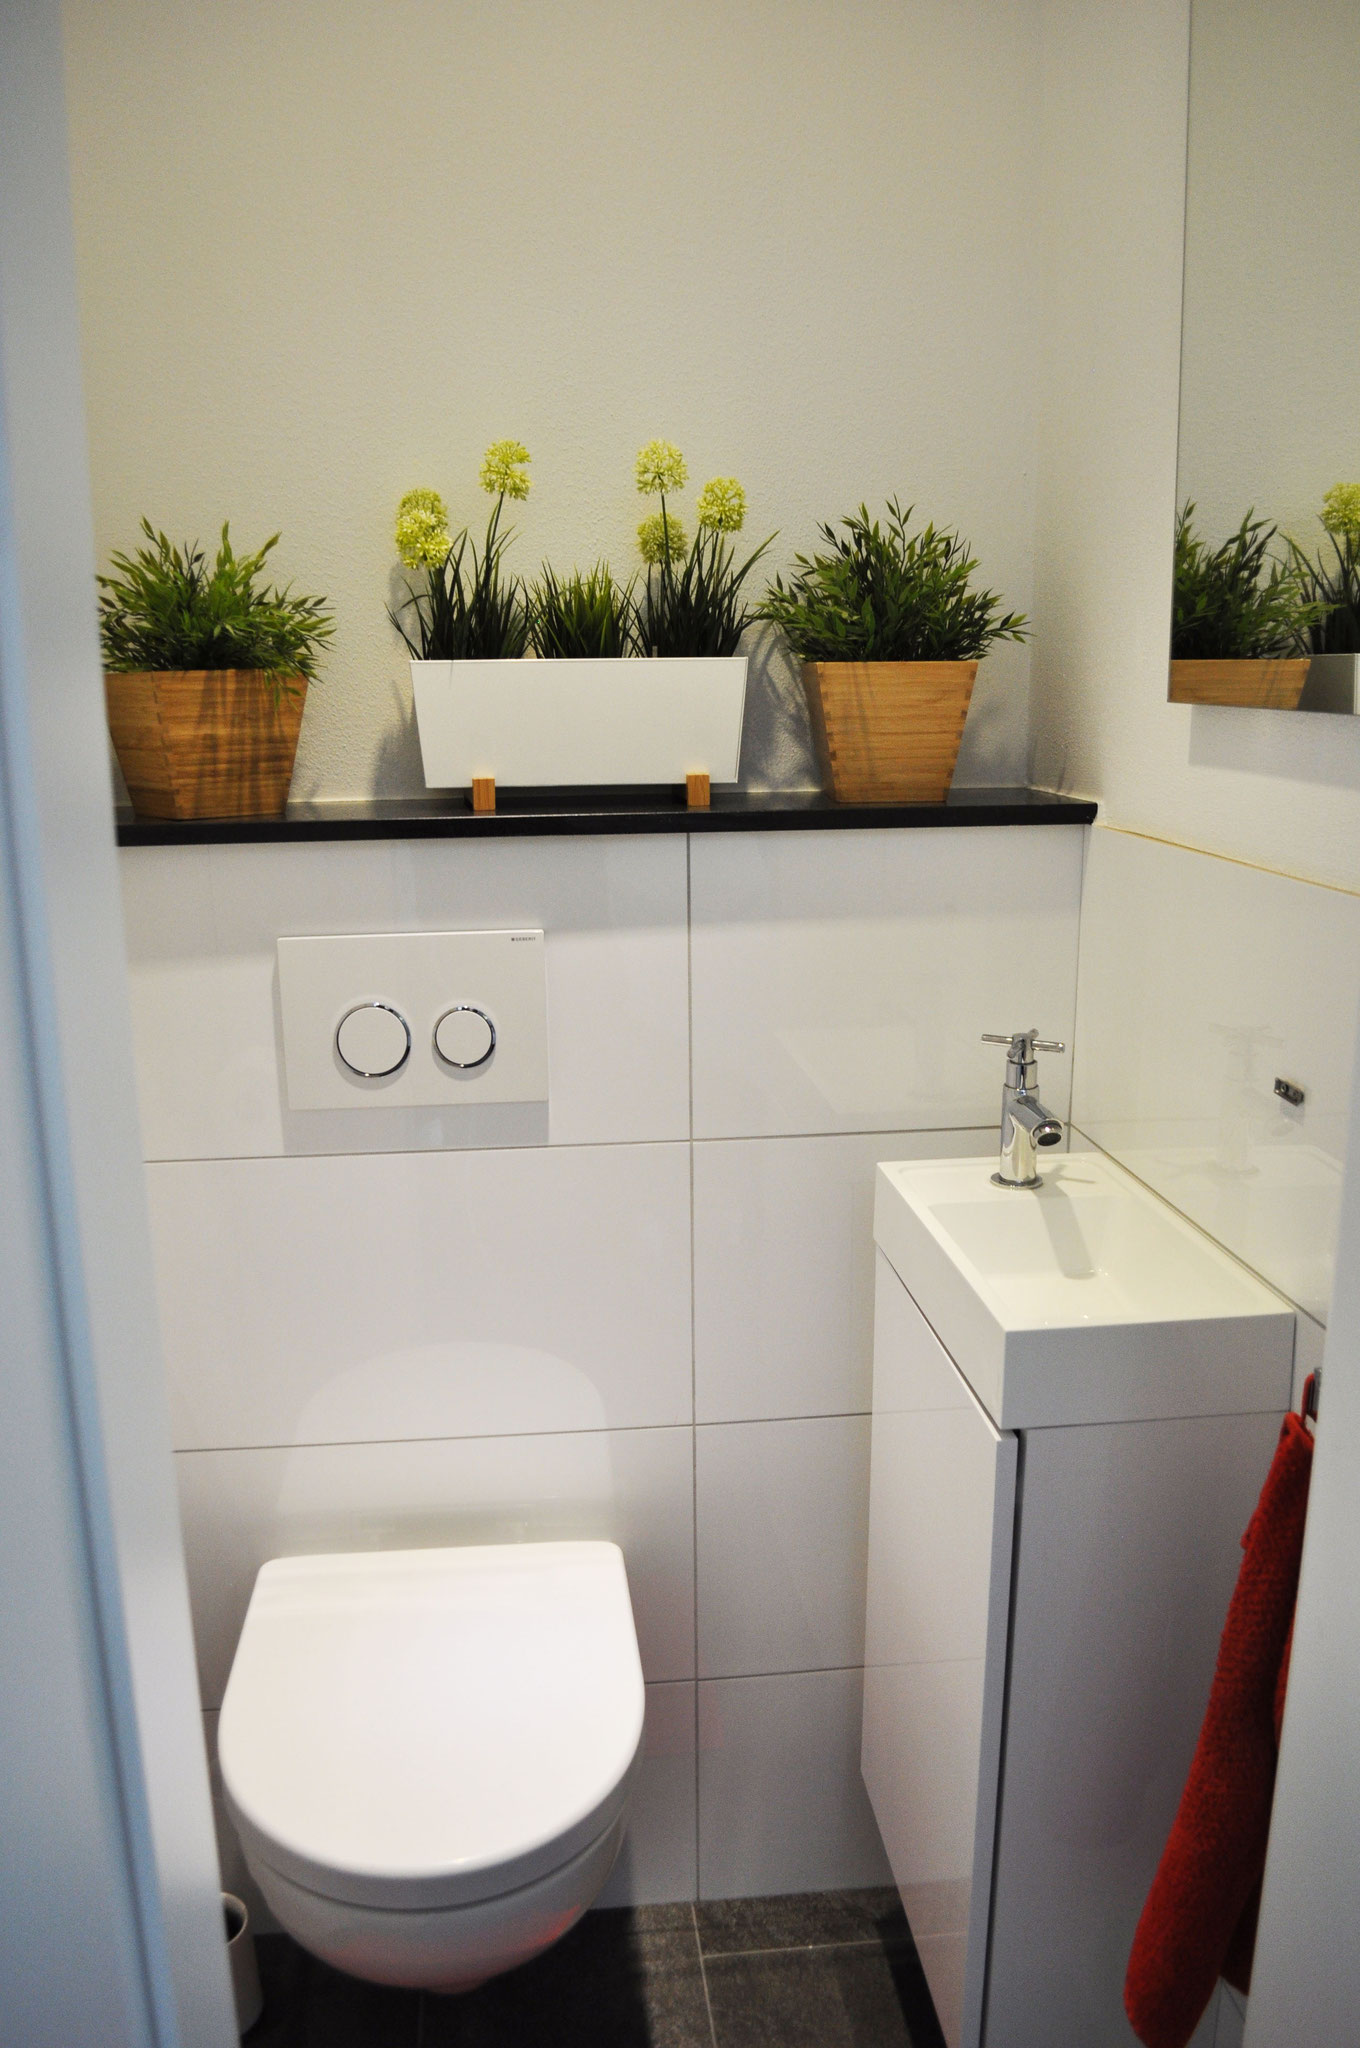 Gäste-WC, Fliesen, Sanitär